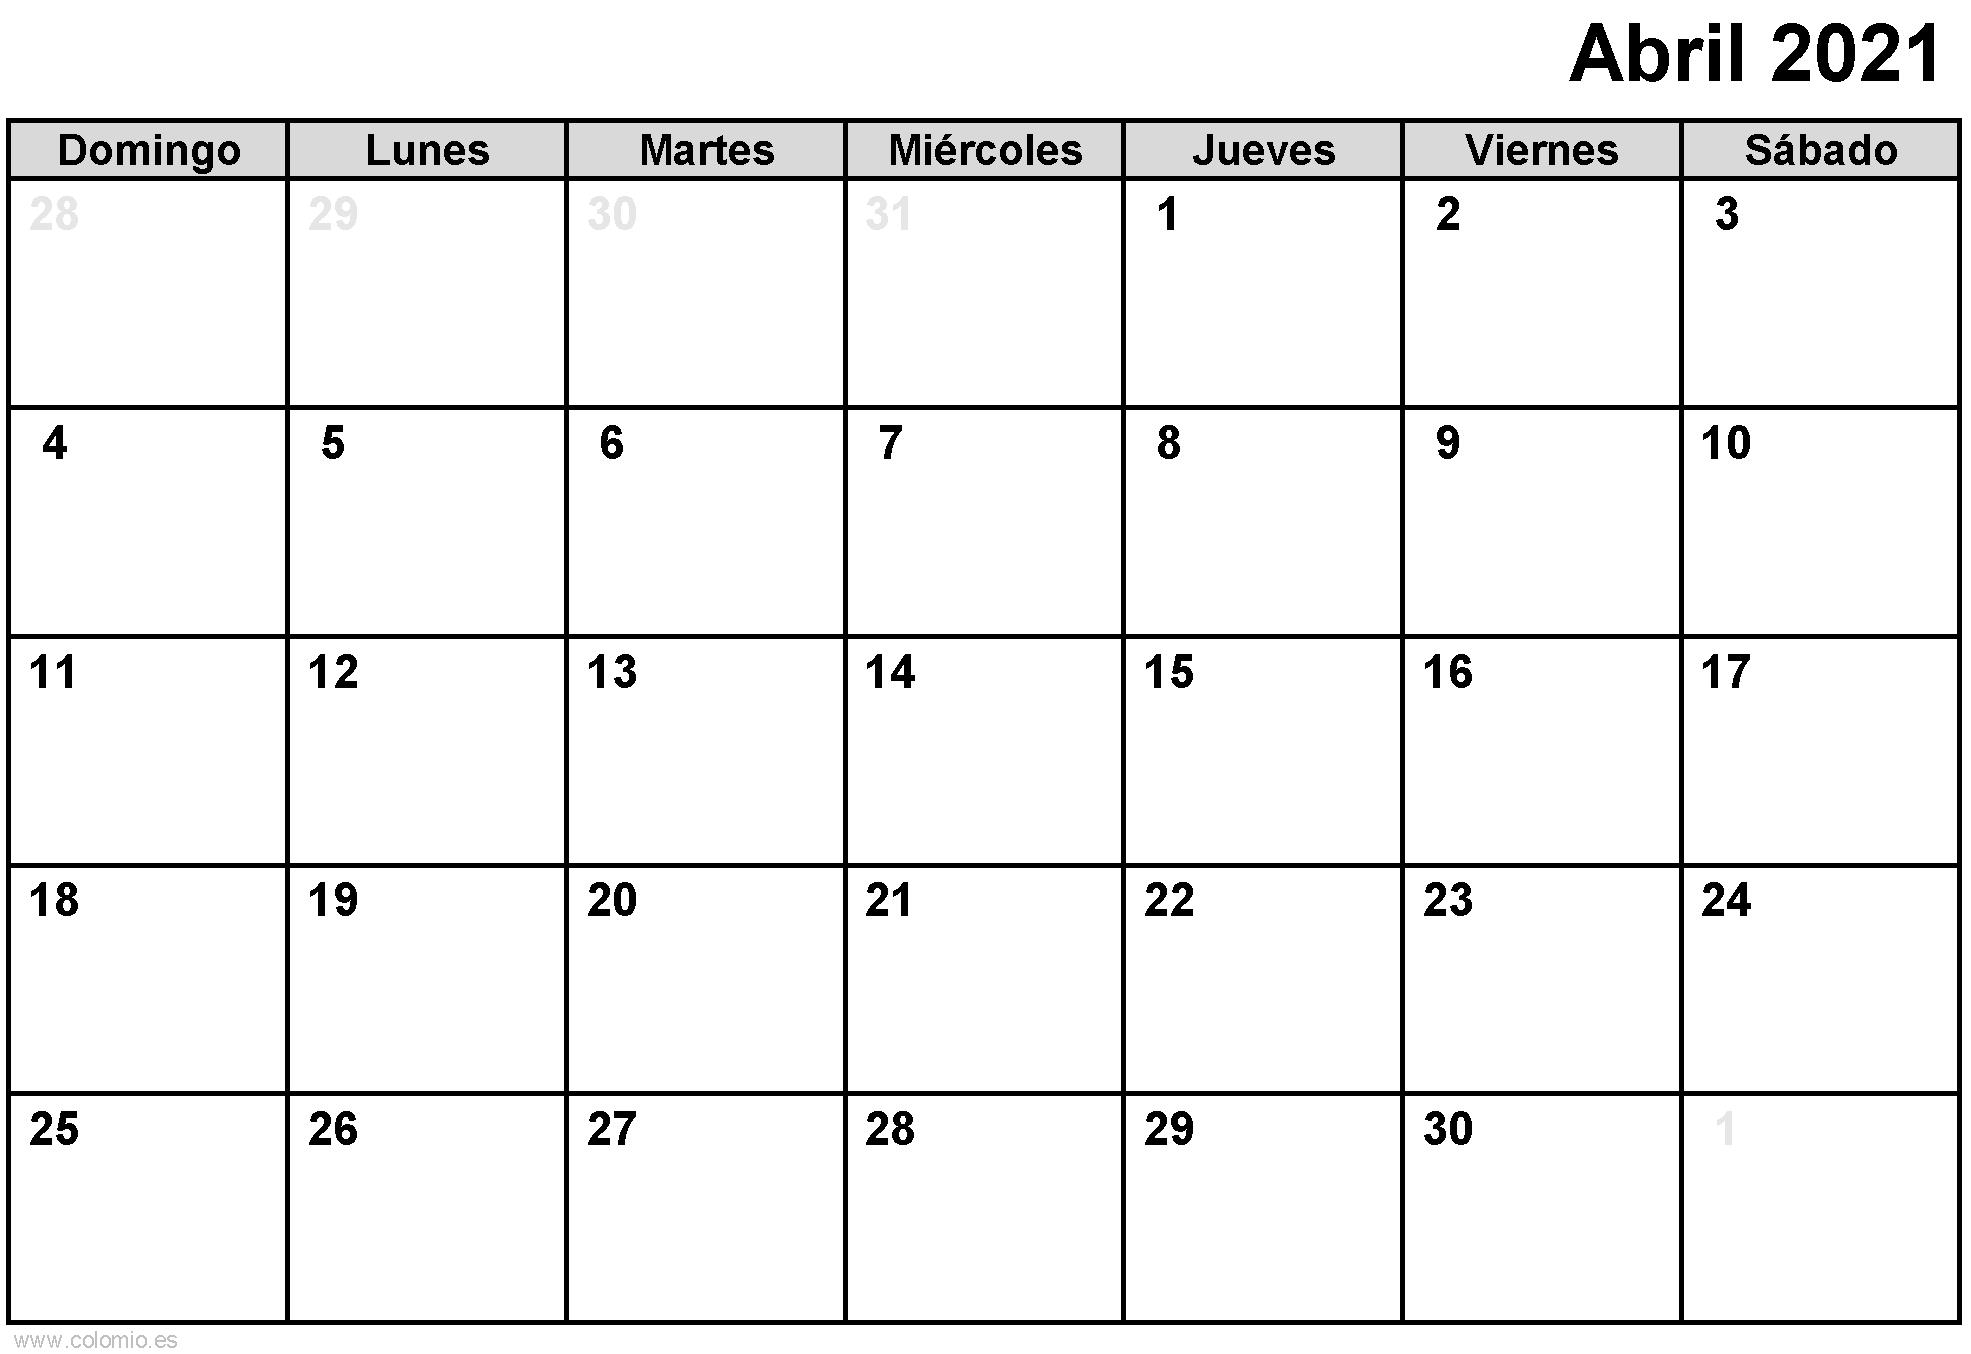 Calendario Abril 2021 para imprimir